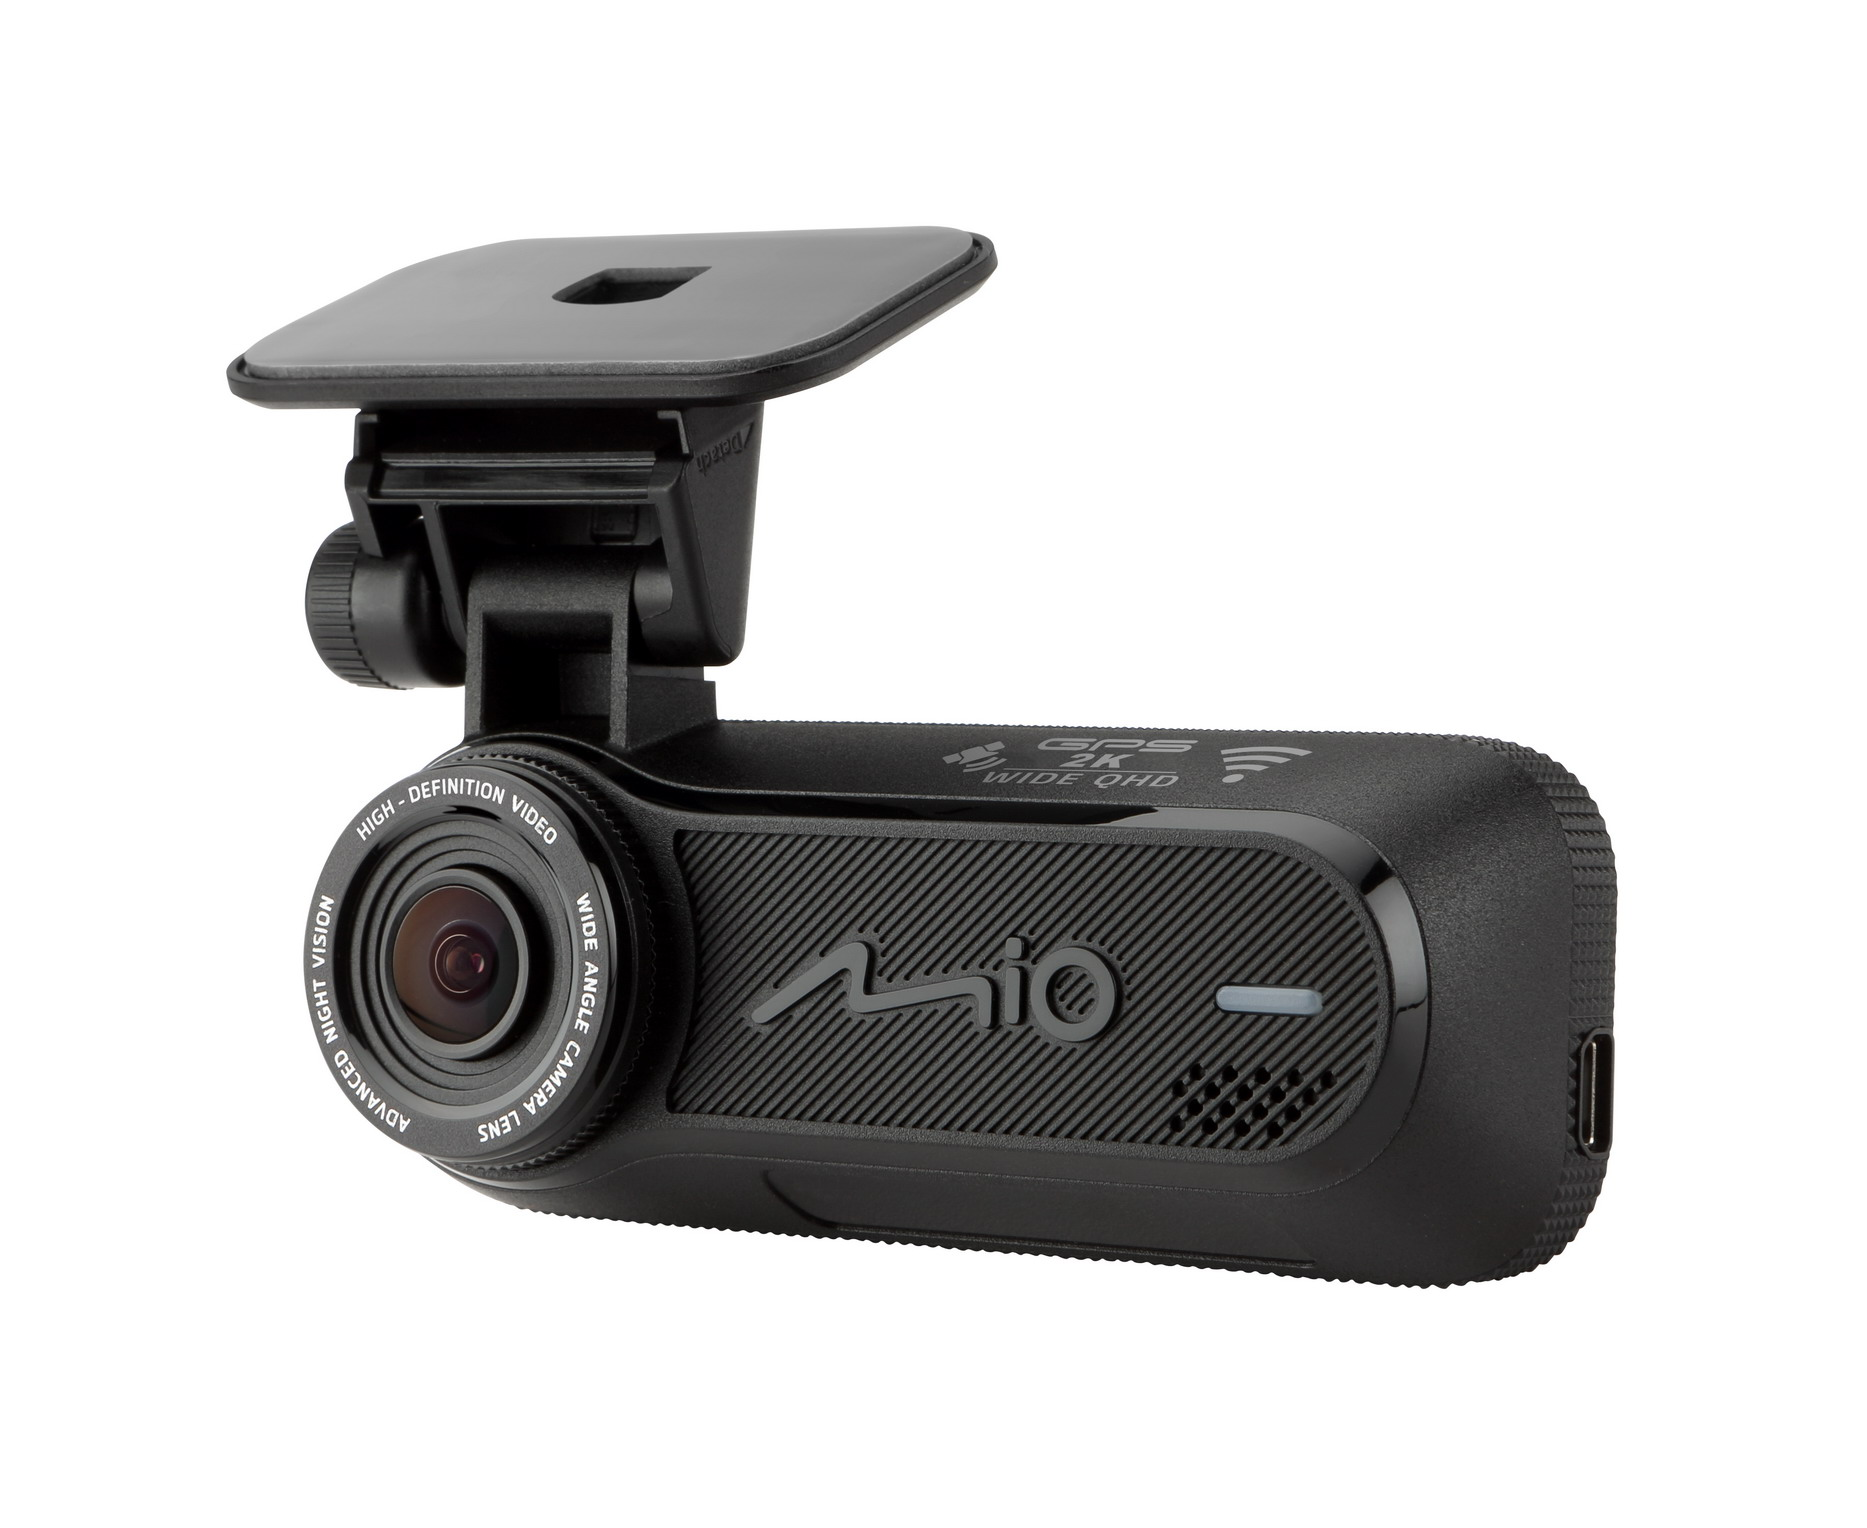 Kamera do auta Mio MiVue J85 WIFI 2.5K QHD - 5415N6060002